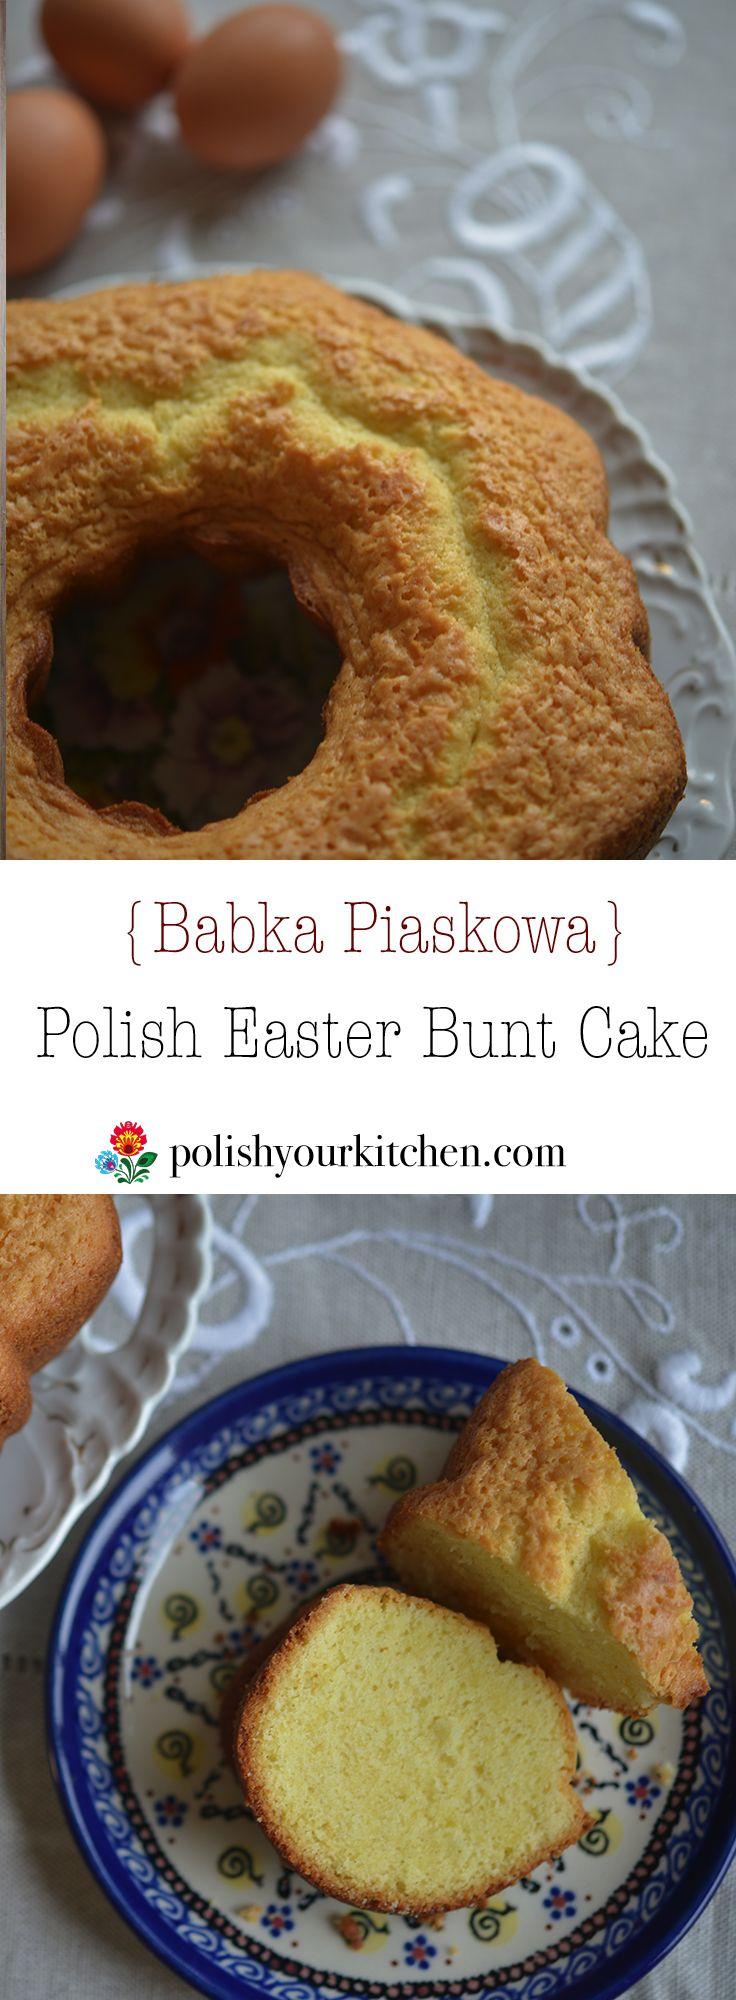 Simple recipe for favorite polish dessert babka sweet light and simple recipe for favorite polish dessert babka sweet light and soft cake forumfinder Images